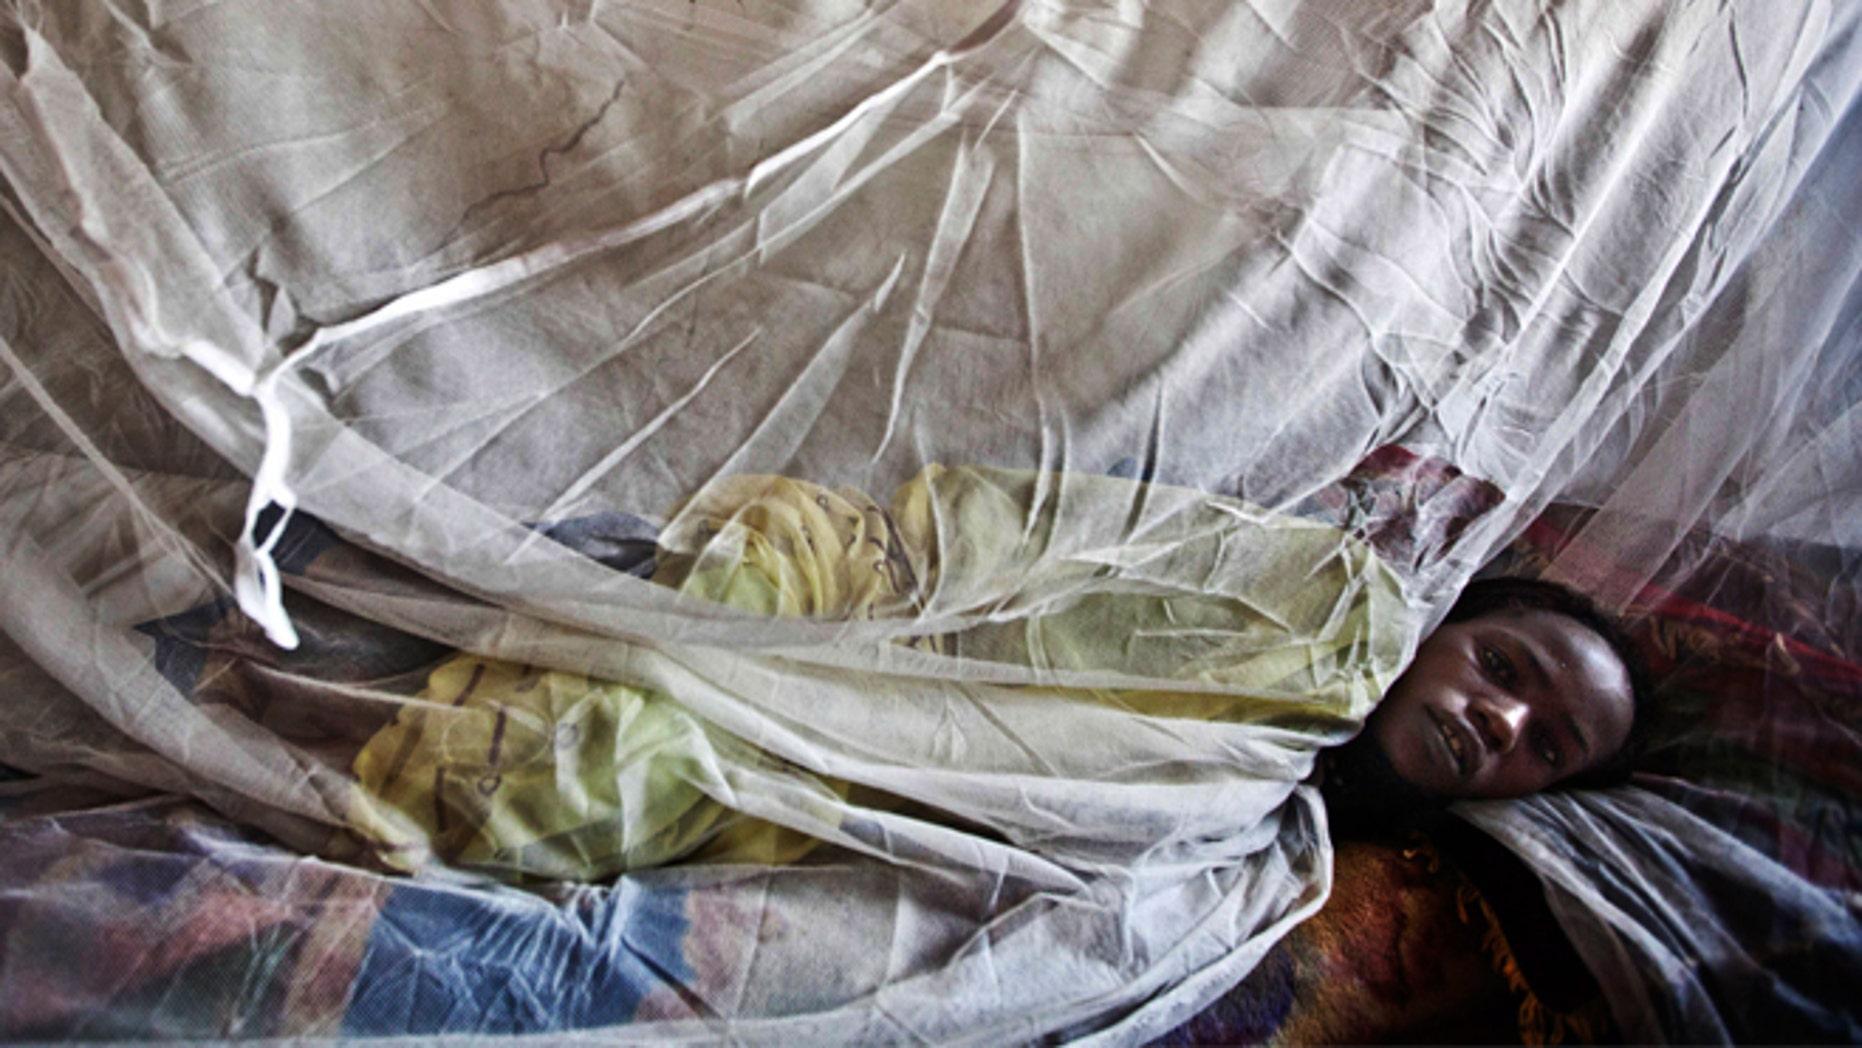 A woman suffering from malaria rests on a bed at a hospital in El Sereif village, North Darfur, Sudan. (AP Photo/UNAMID, Albert Gonzalez Farran, File)